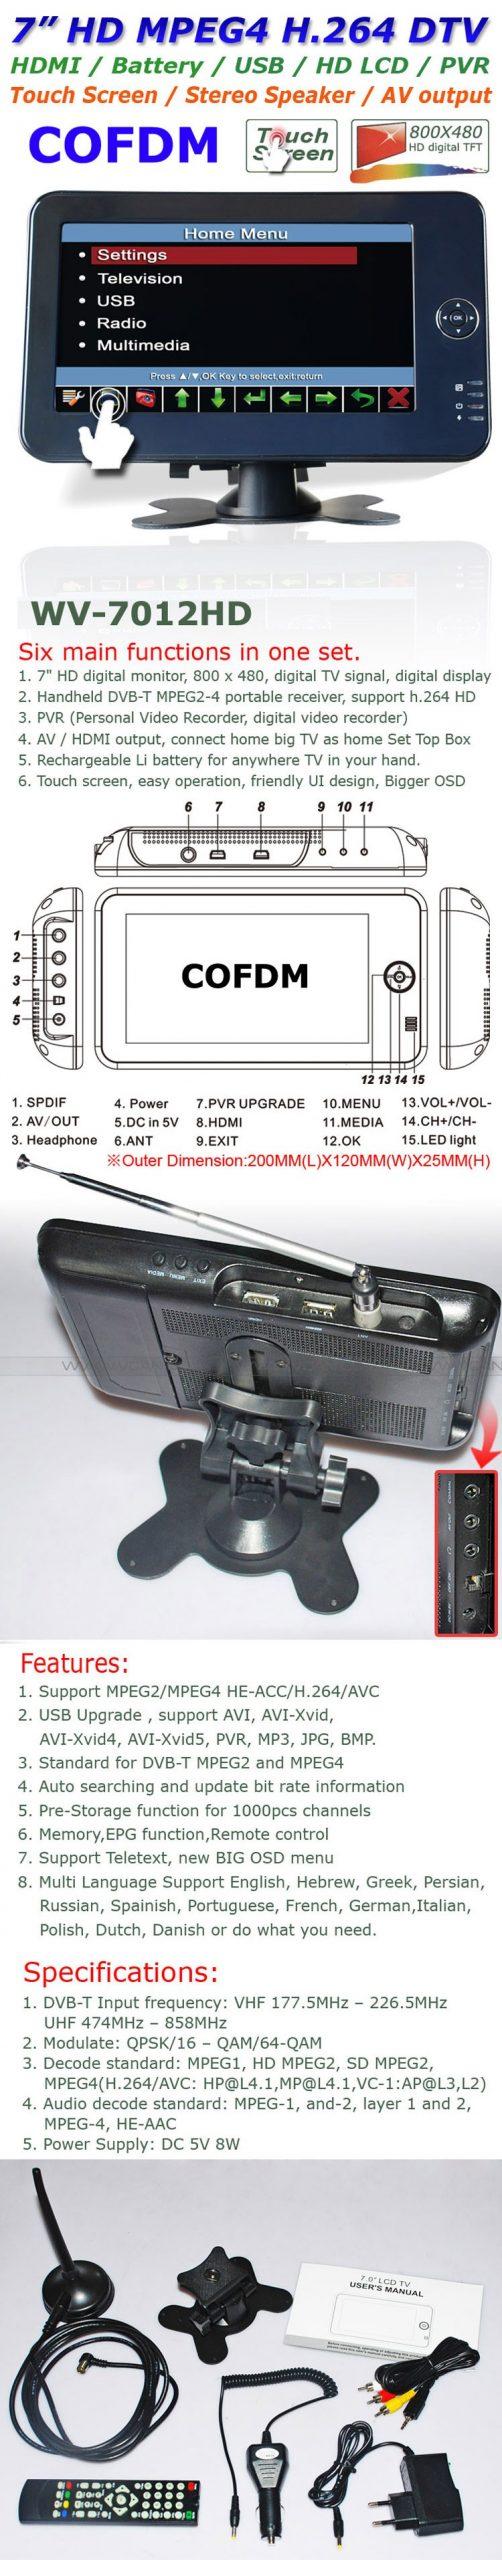 7 inch monitor DVB-T Portable handheld HD dvb-t TV receive box with PVR recorder/USB Media player DVB-T7012HD 3